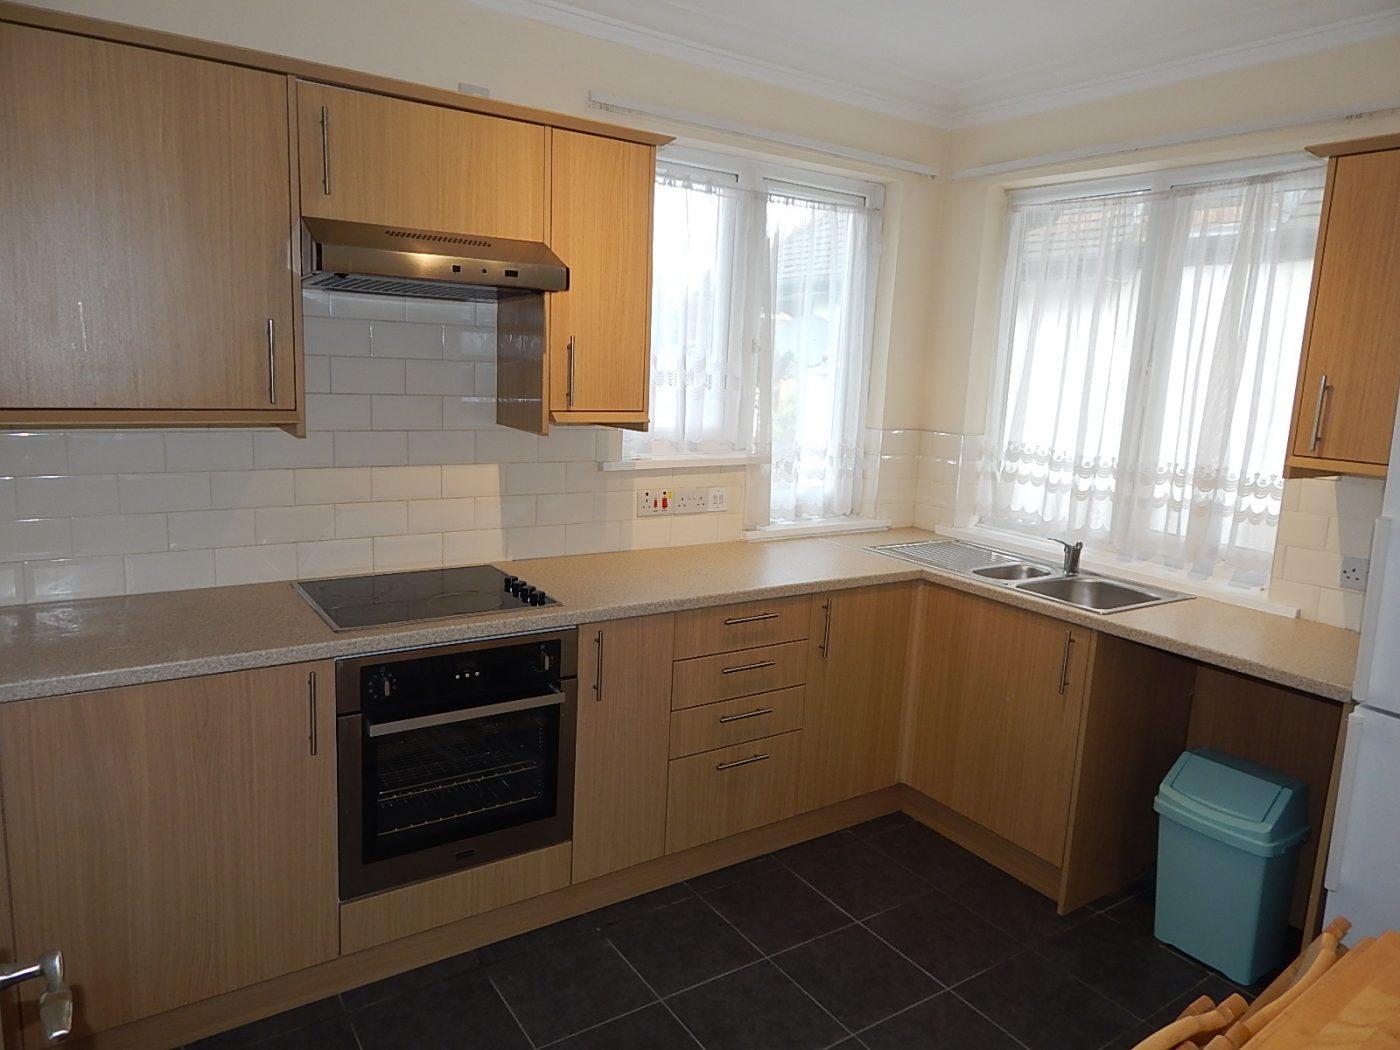 Hodford Road, NW11 - 2 Bedroom Flat